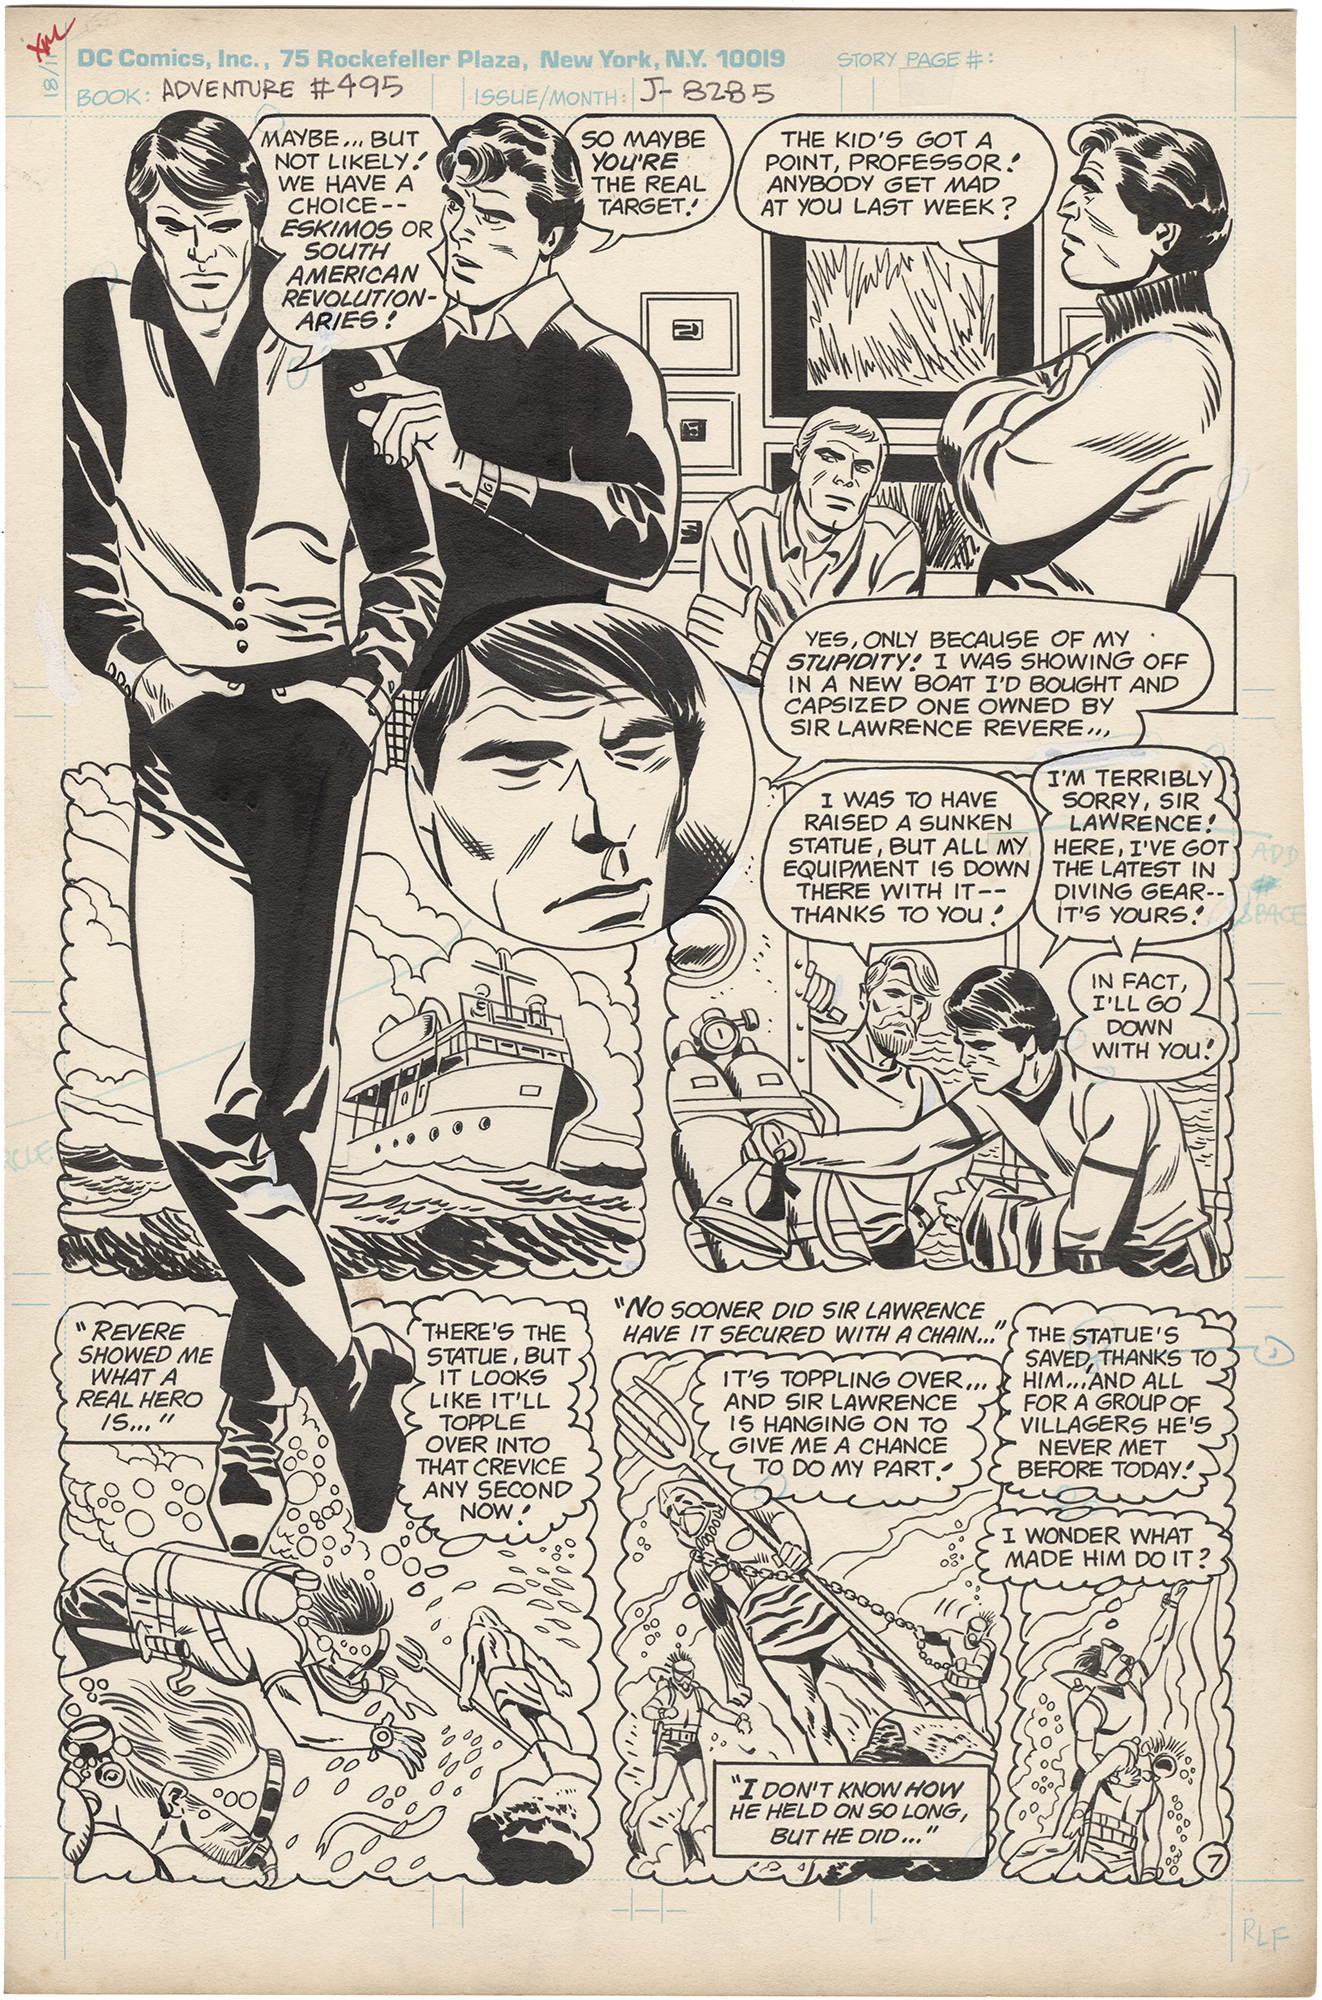 Adventure Comics #495 p7